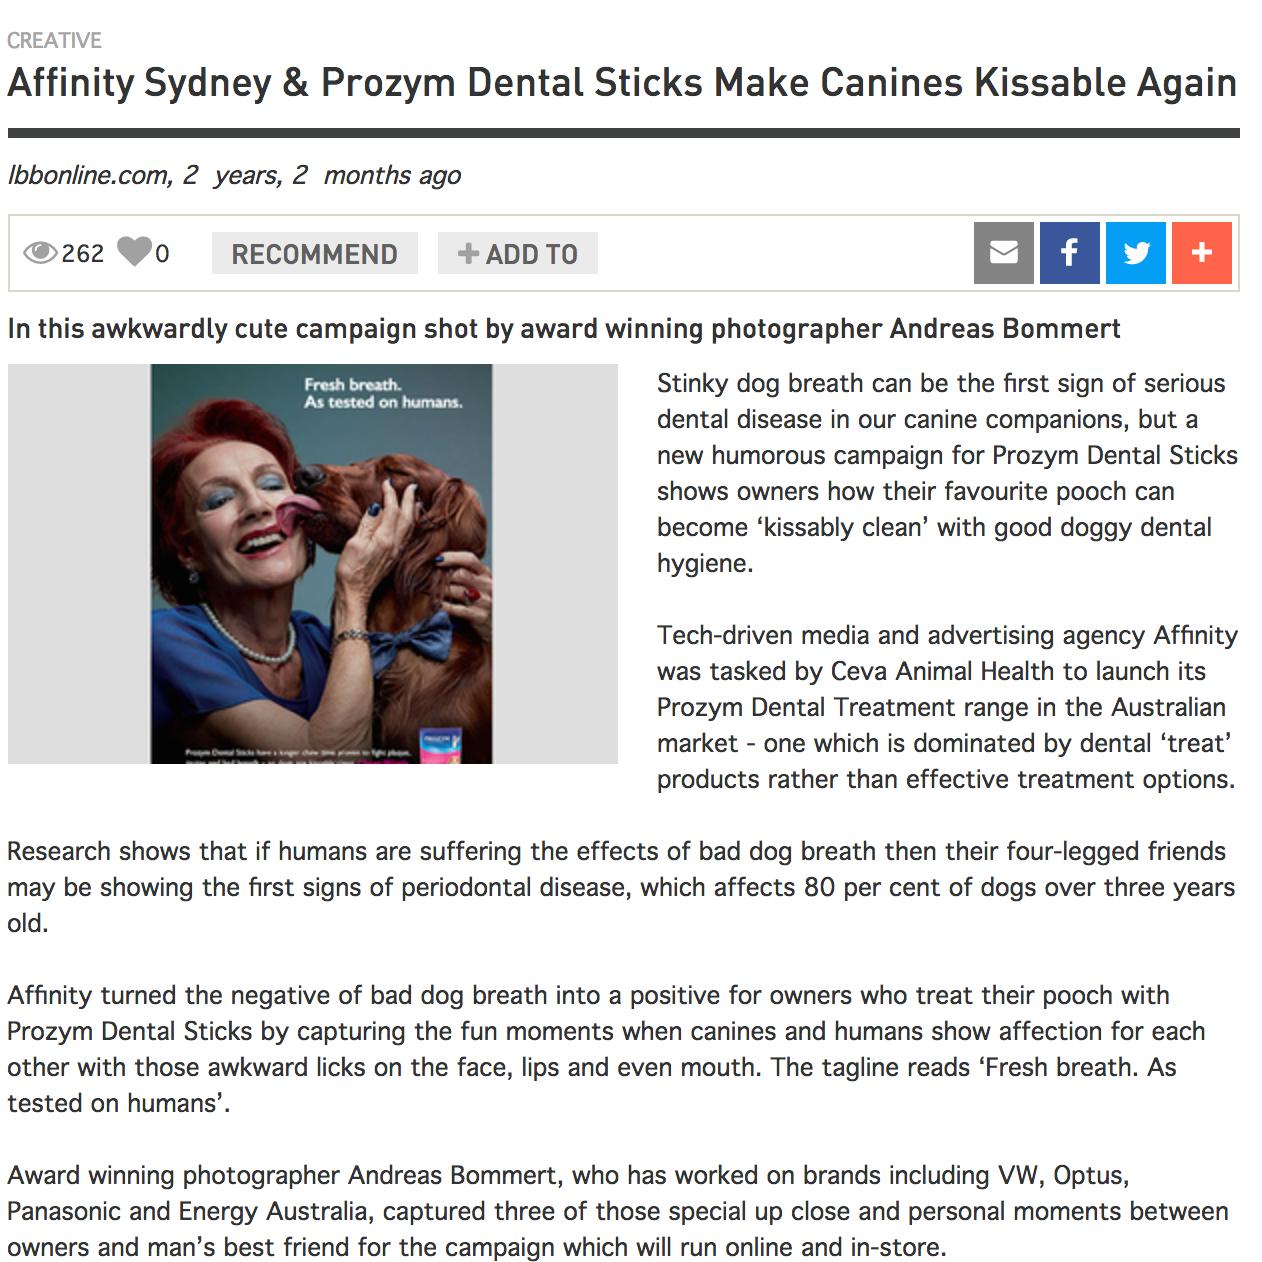 LITTLE BLACK BOOK  Affinity Sydney & Prozym Dental Sticks Make Canines Kissable Again